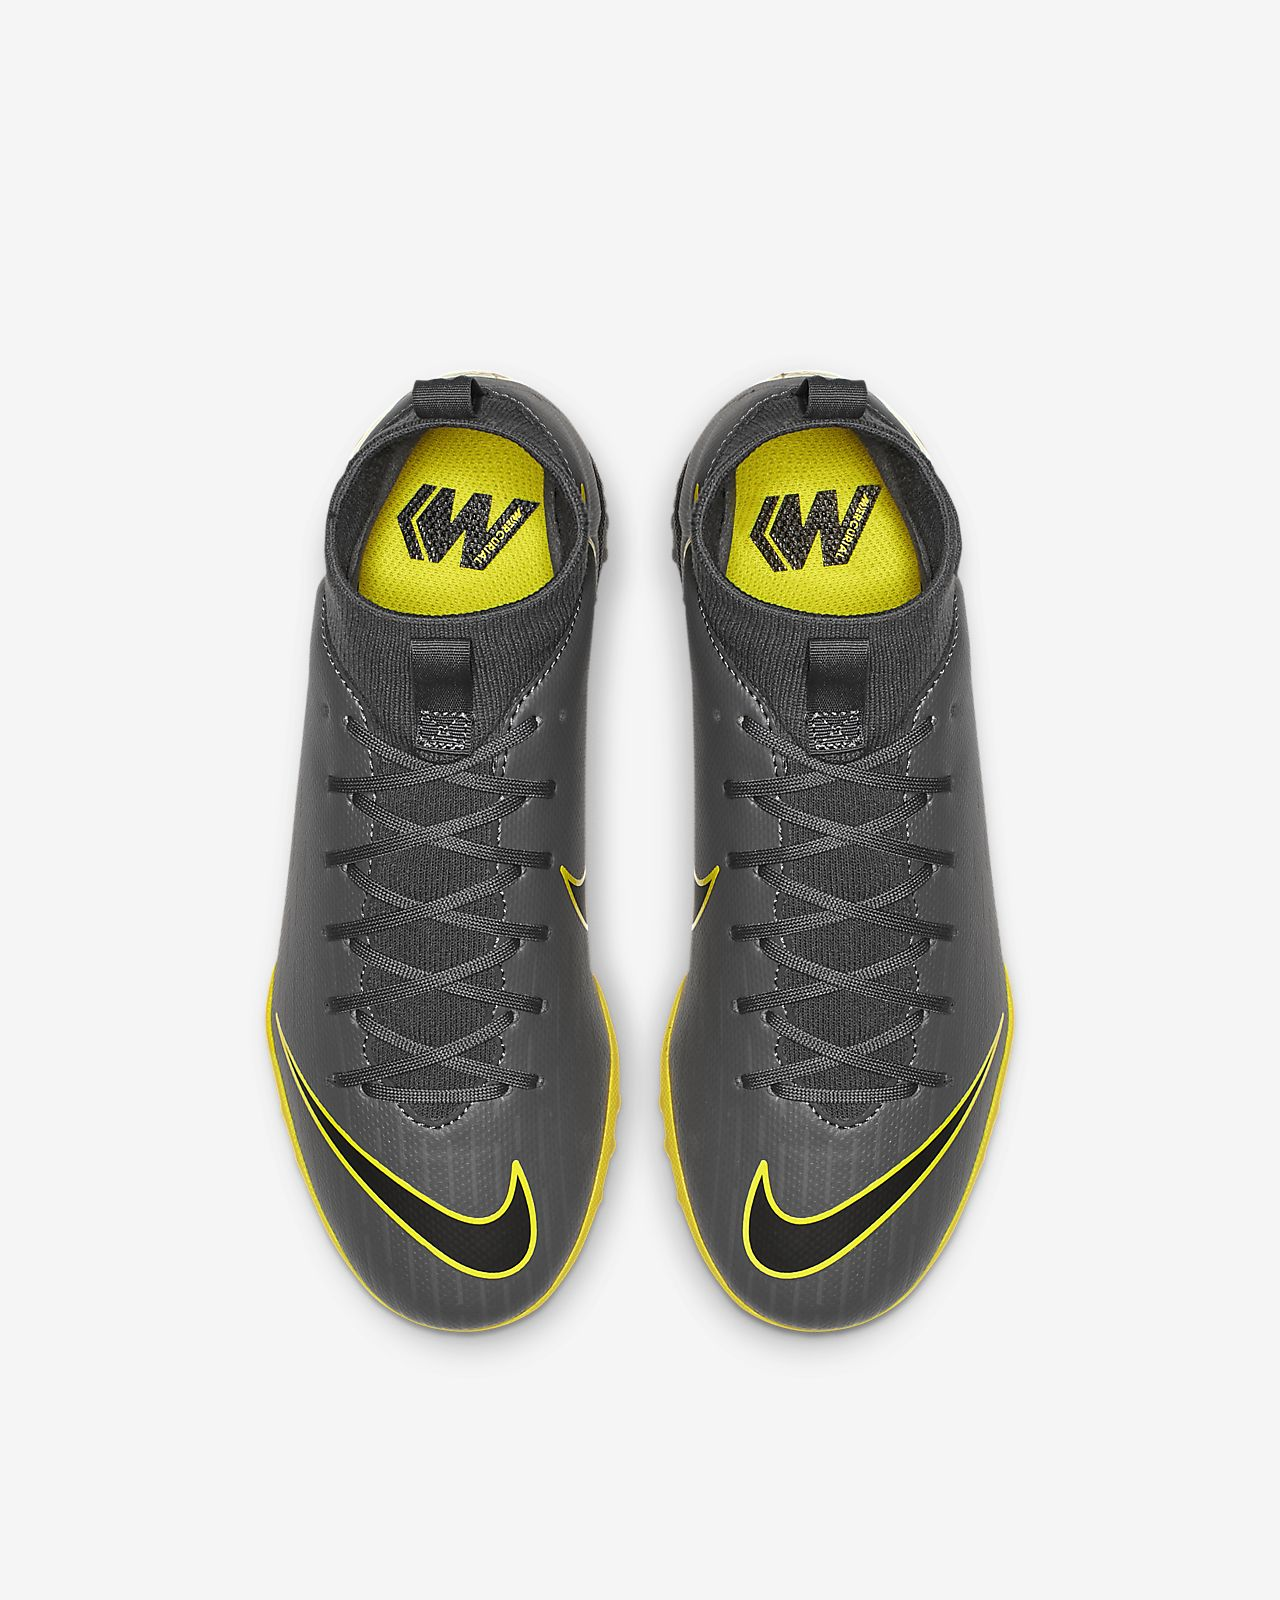 Nike Jr. Mercurial Superfly 6 Academy TF Botas de fútbol para hierba artificial o moqueta Turf Niñoa y niñoa pequeñoa